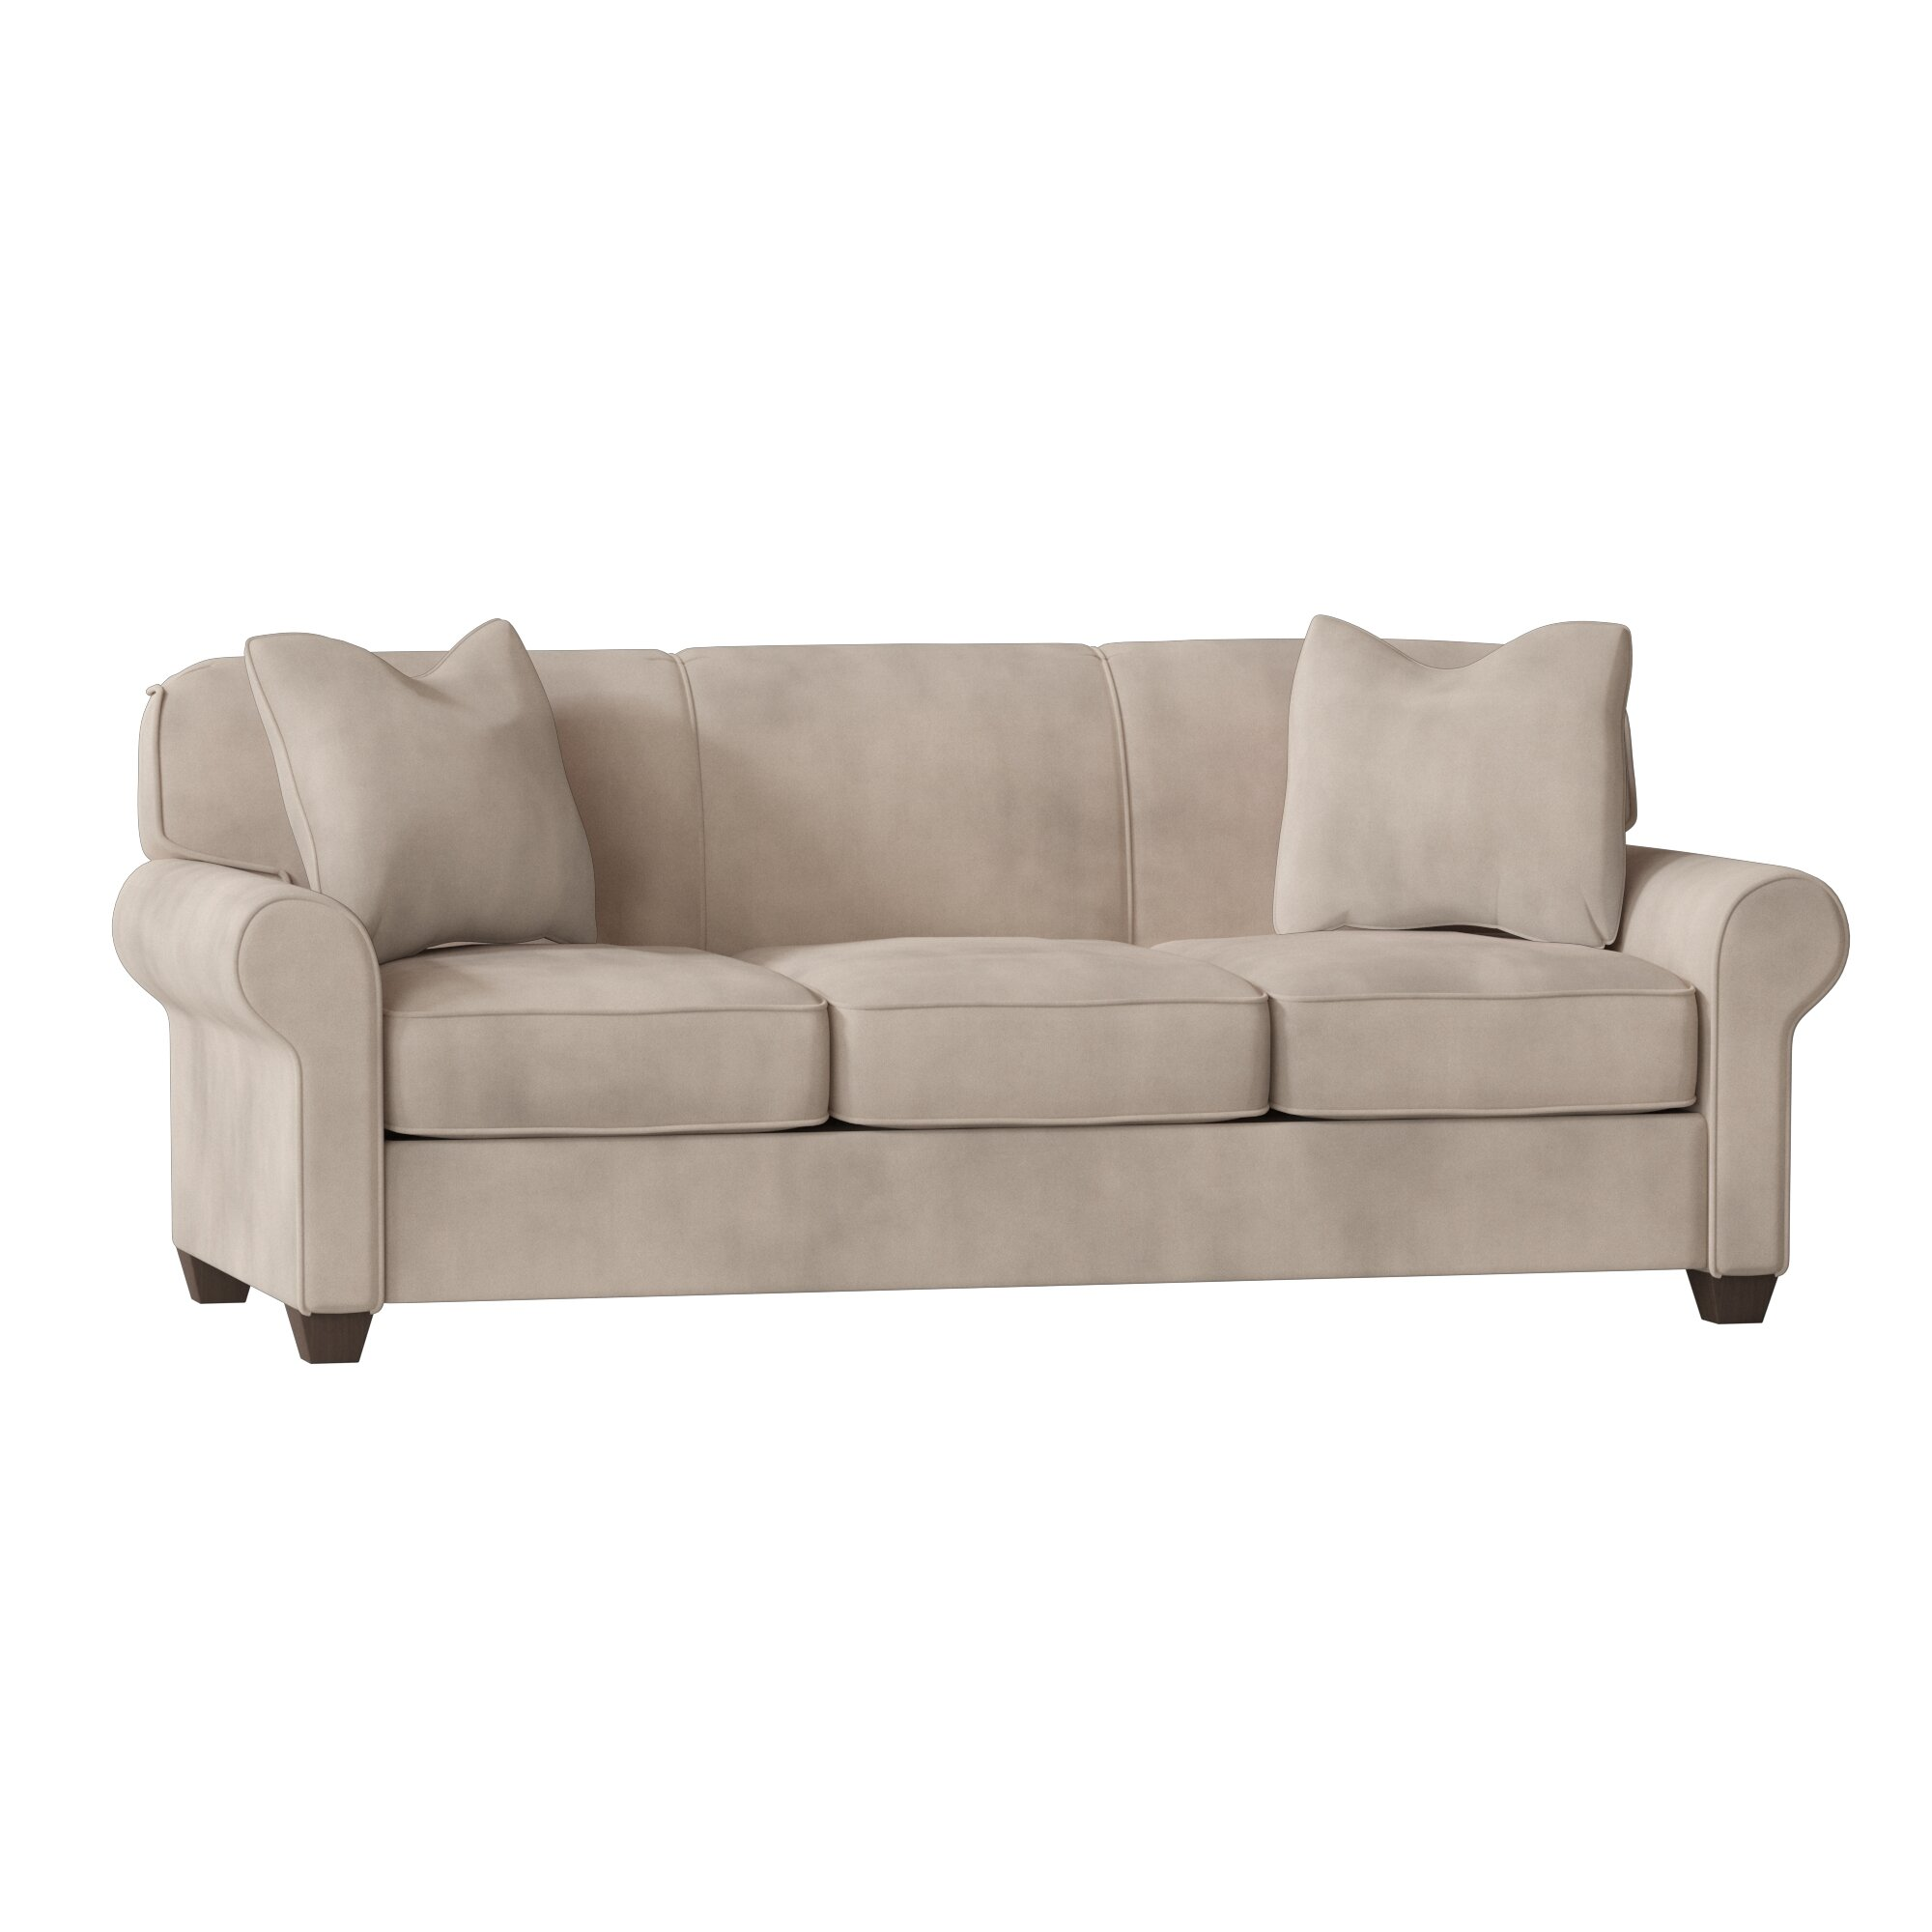 Wayfair Custom Upholstery Jennifer 81